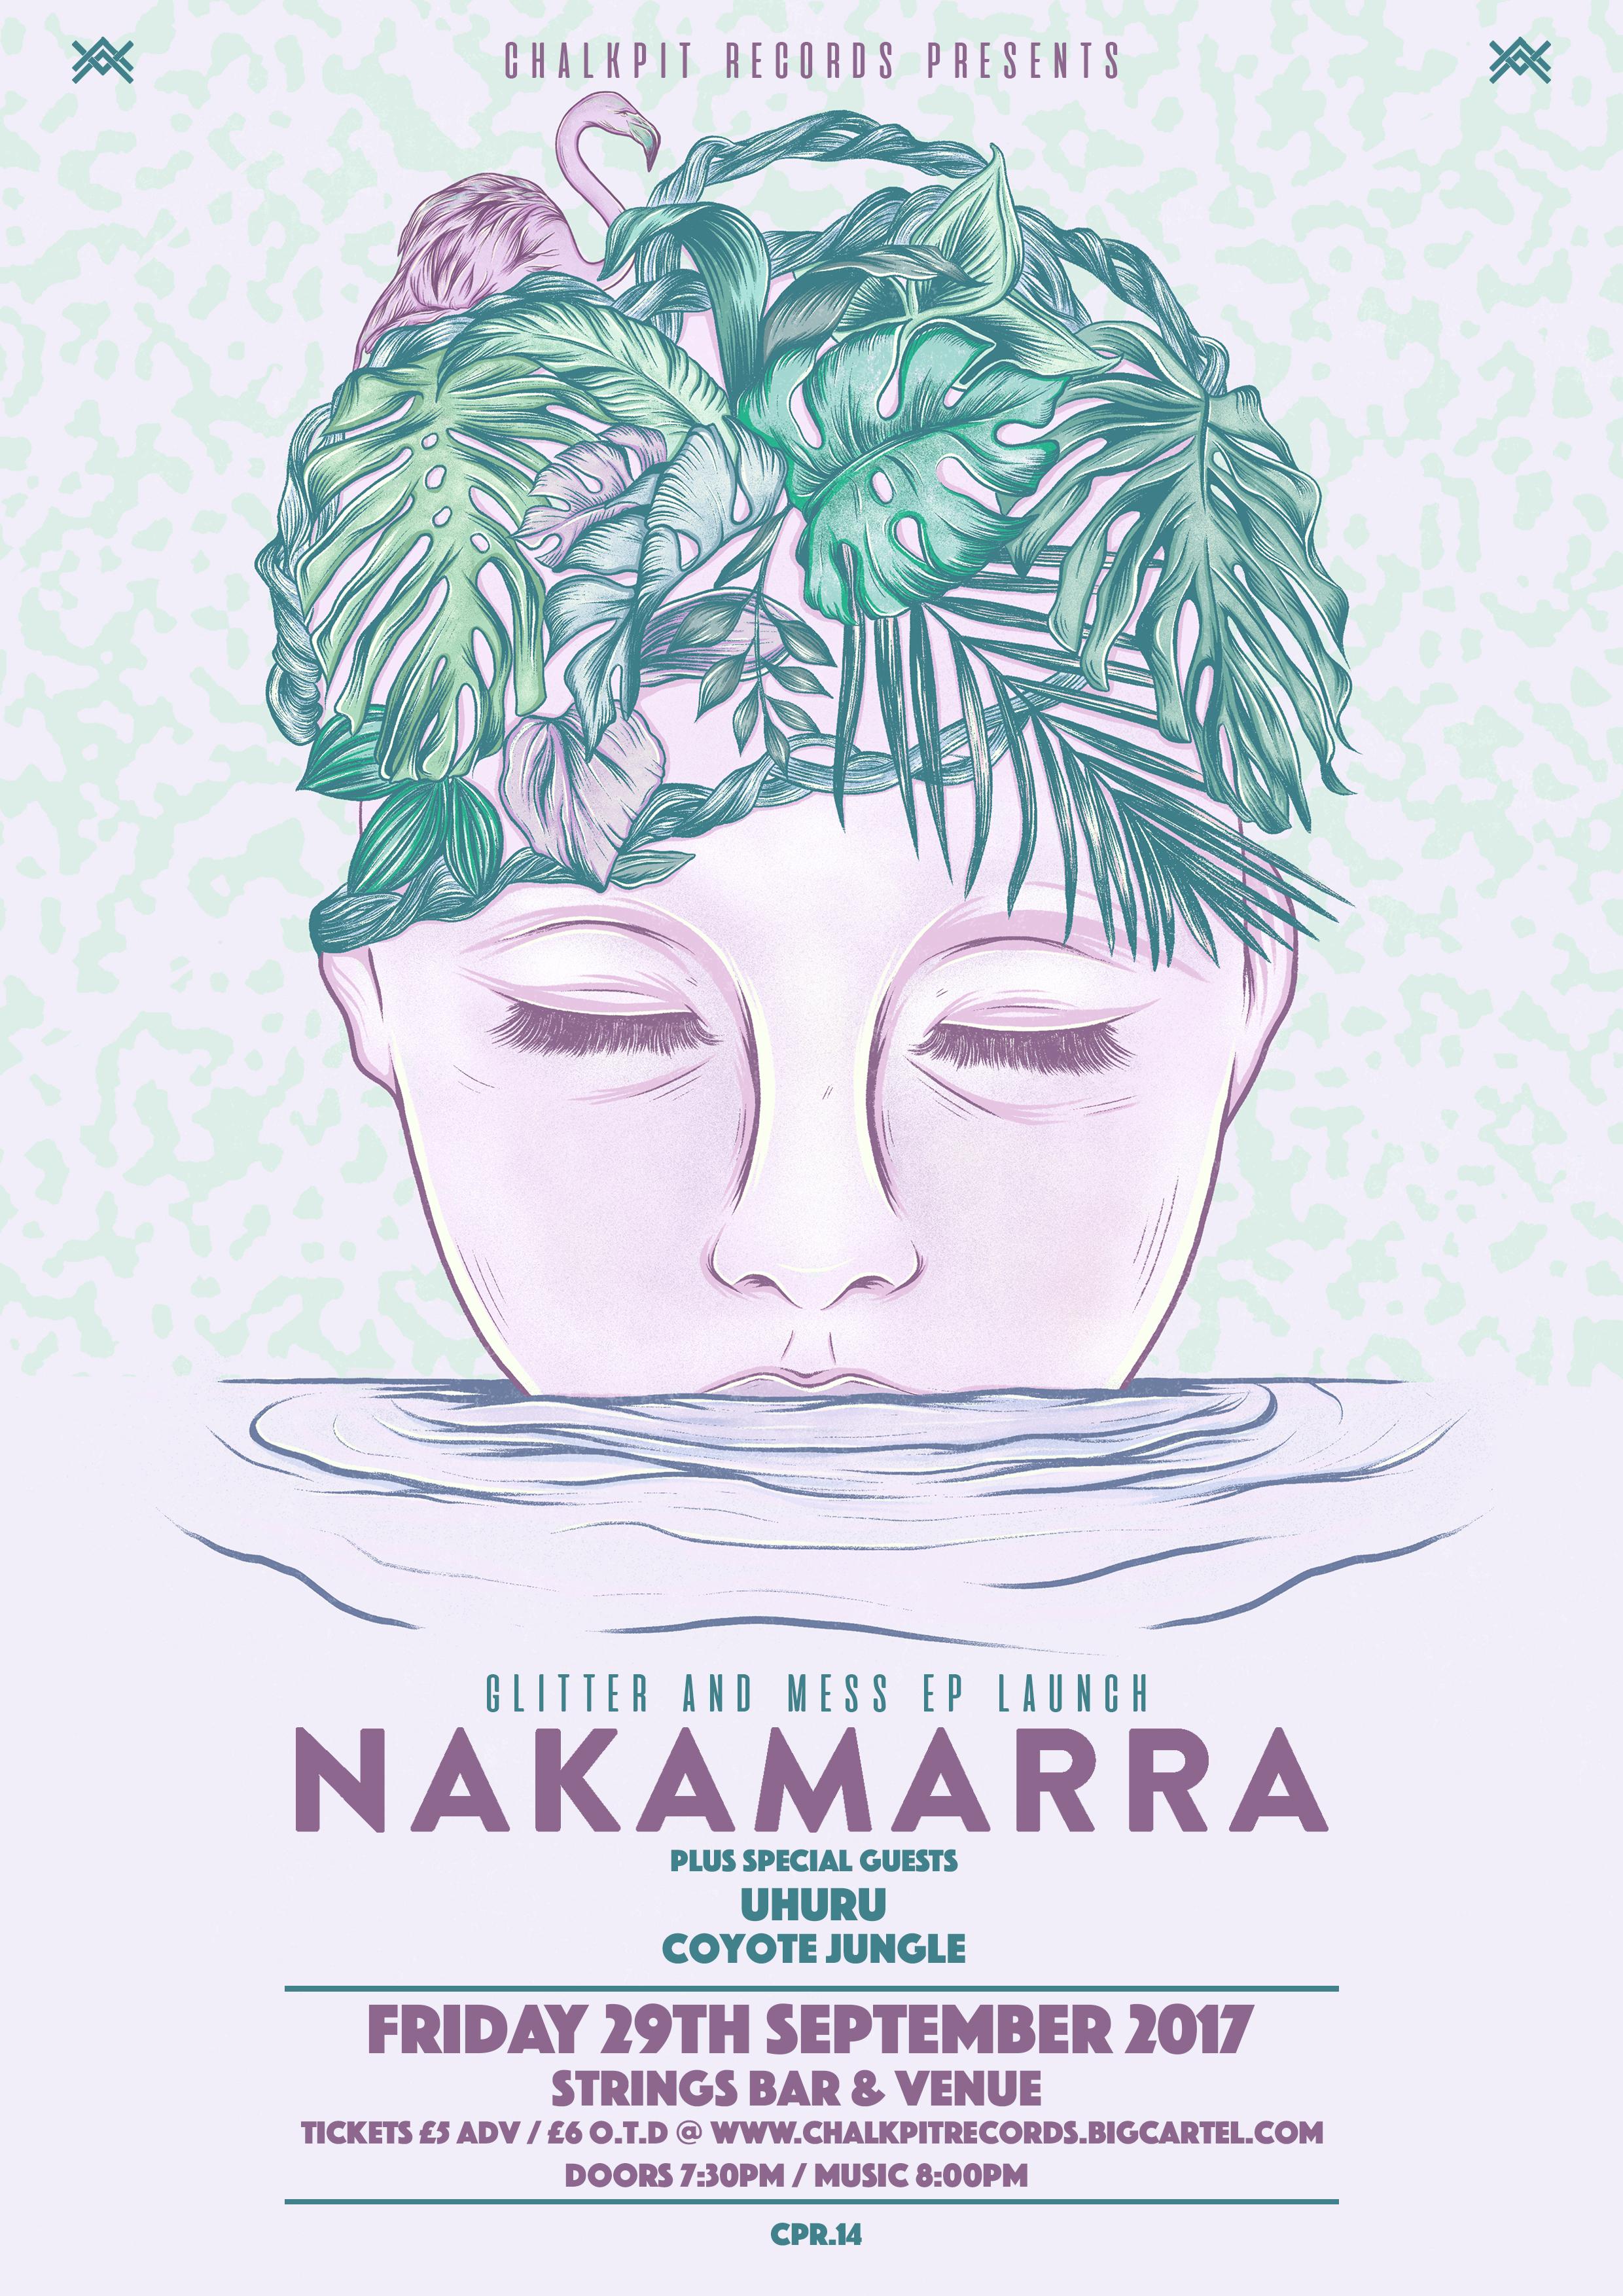 Nakamarra EP Launch at Strings